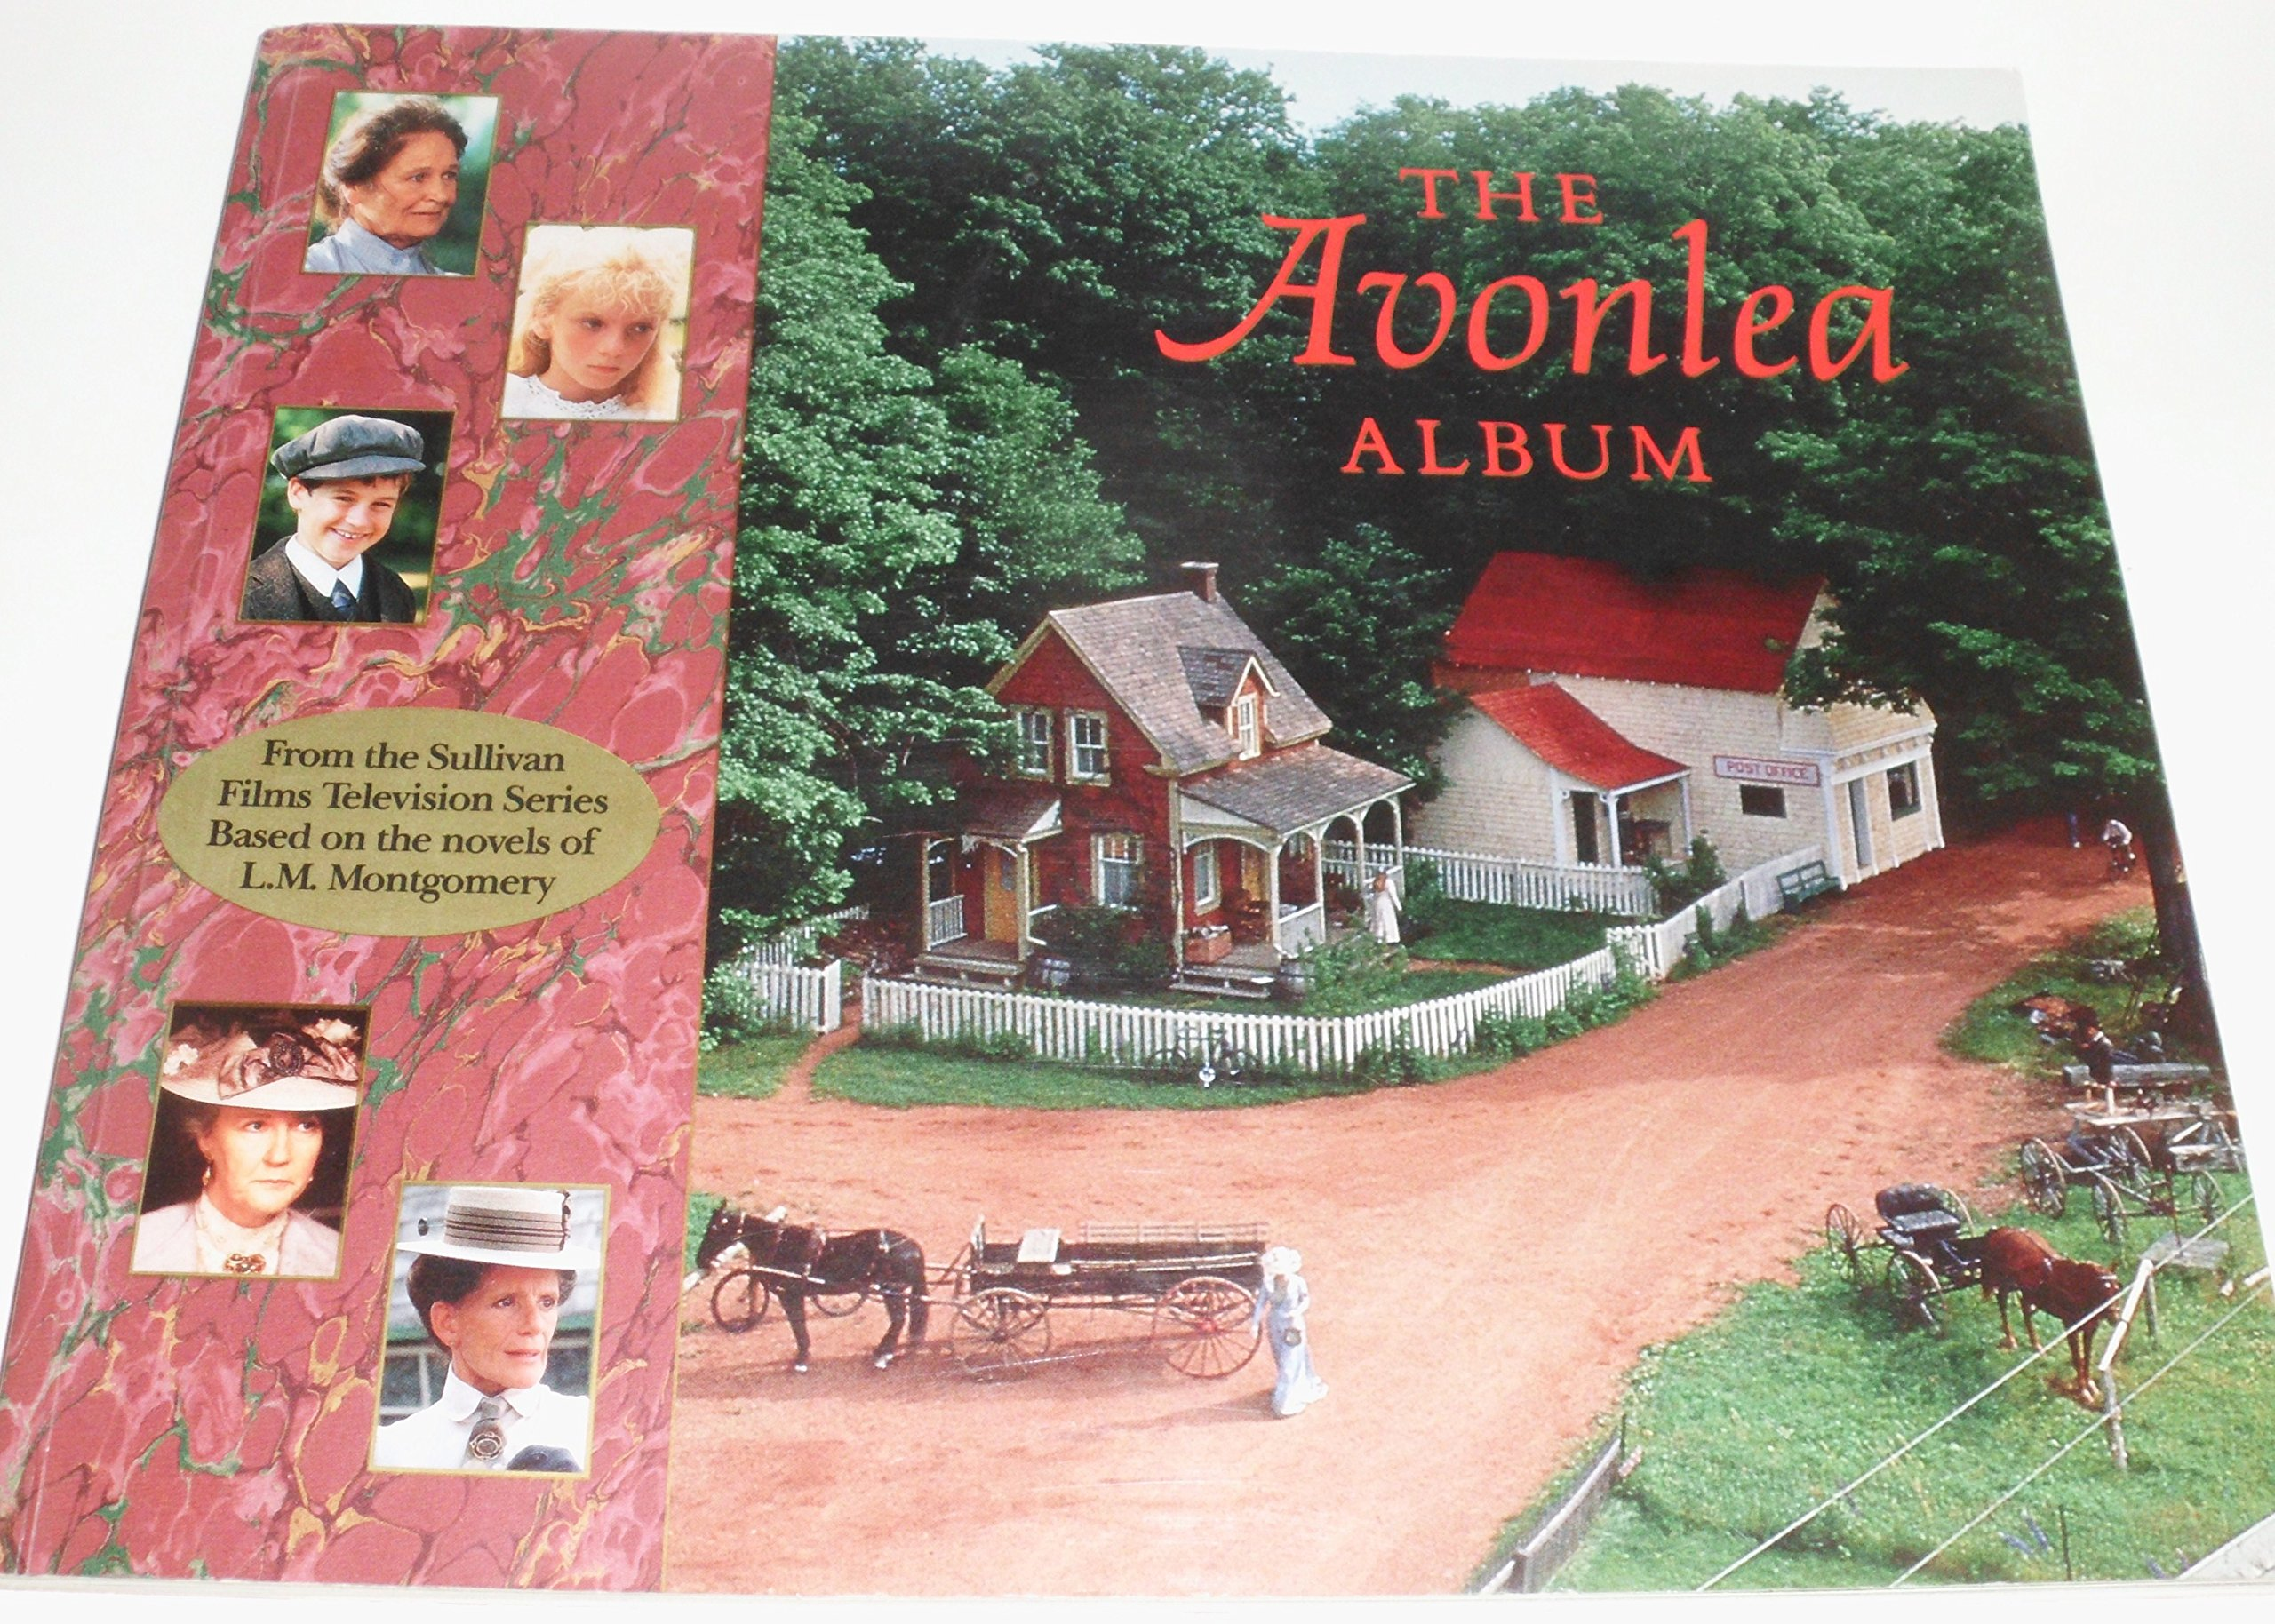 An Avonlea Album